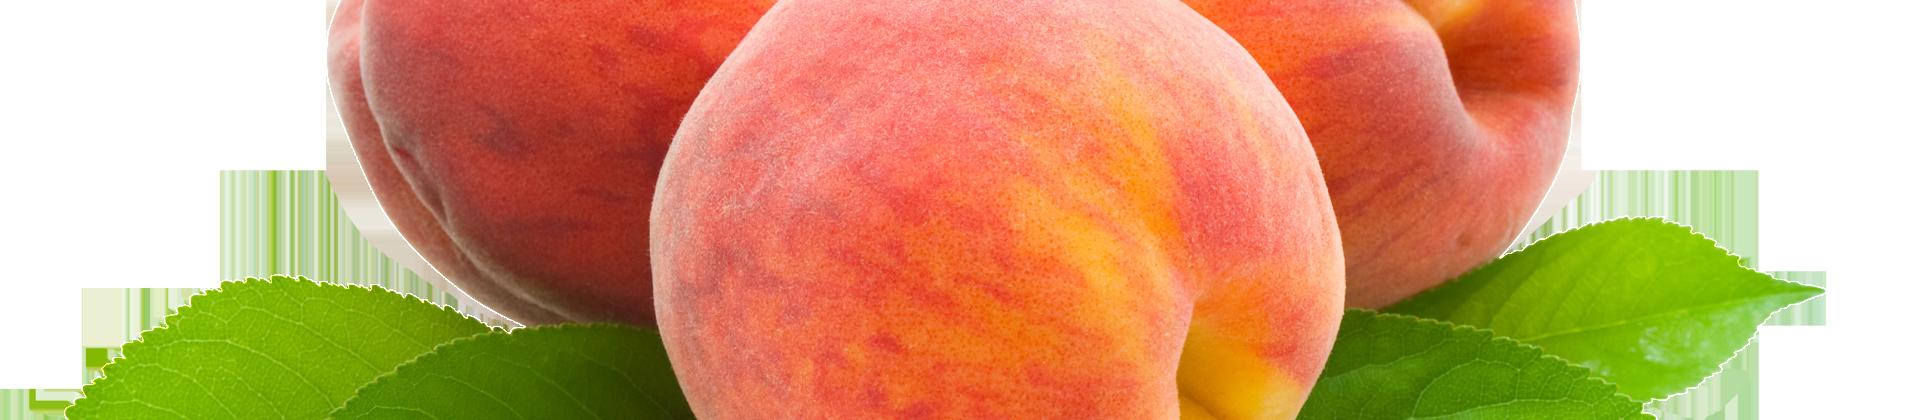 peach_PNG4860